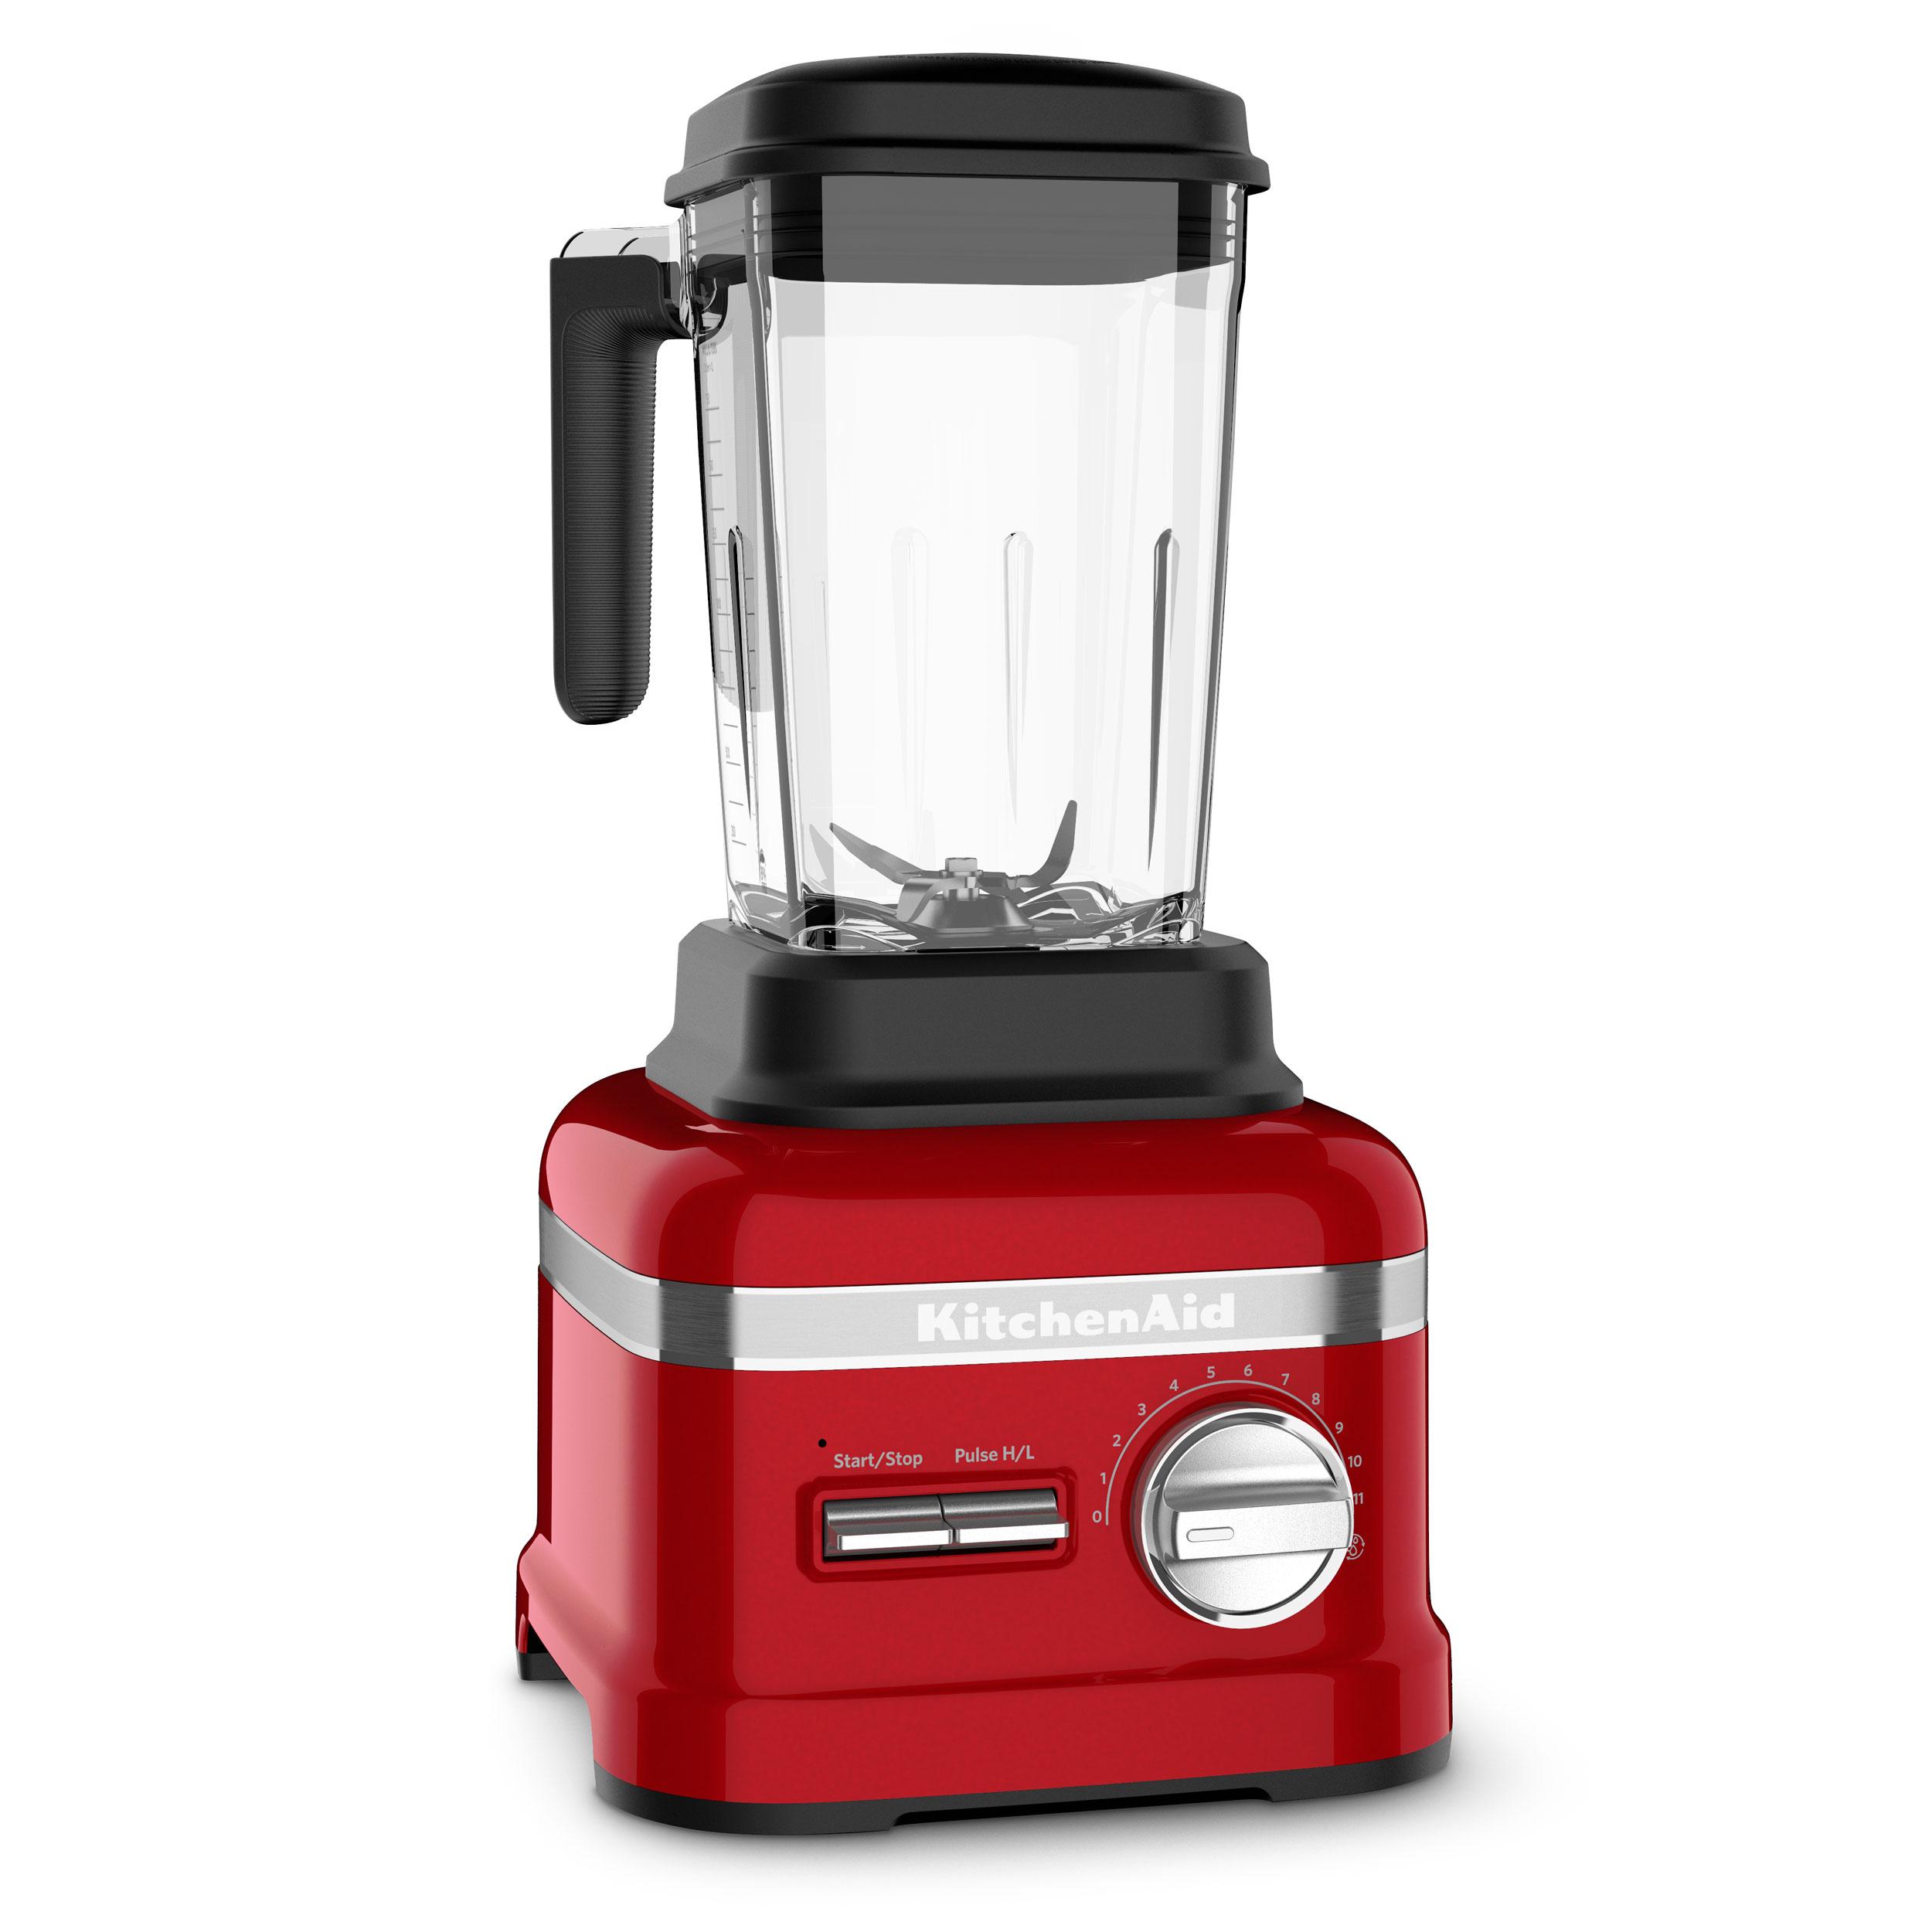 cgi photo of kitchen aid blender